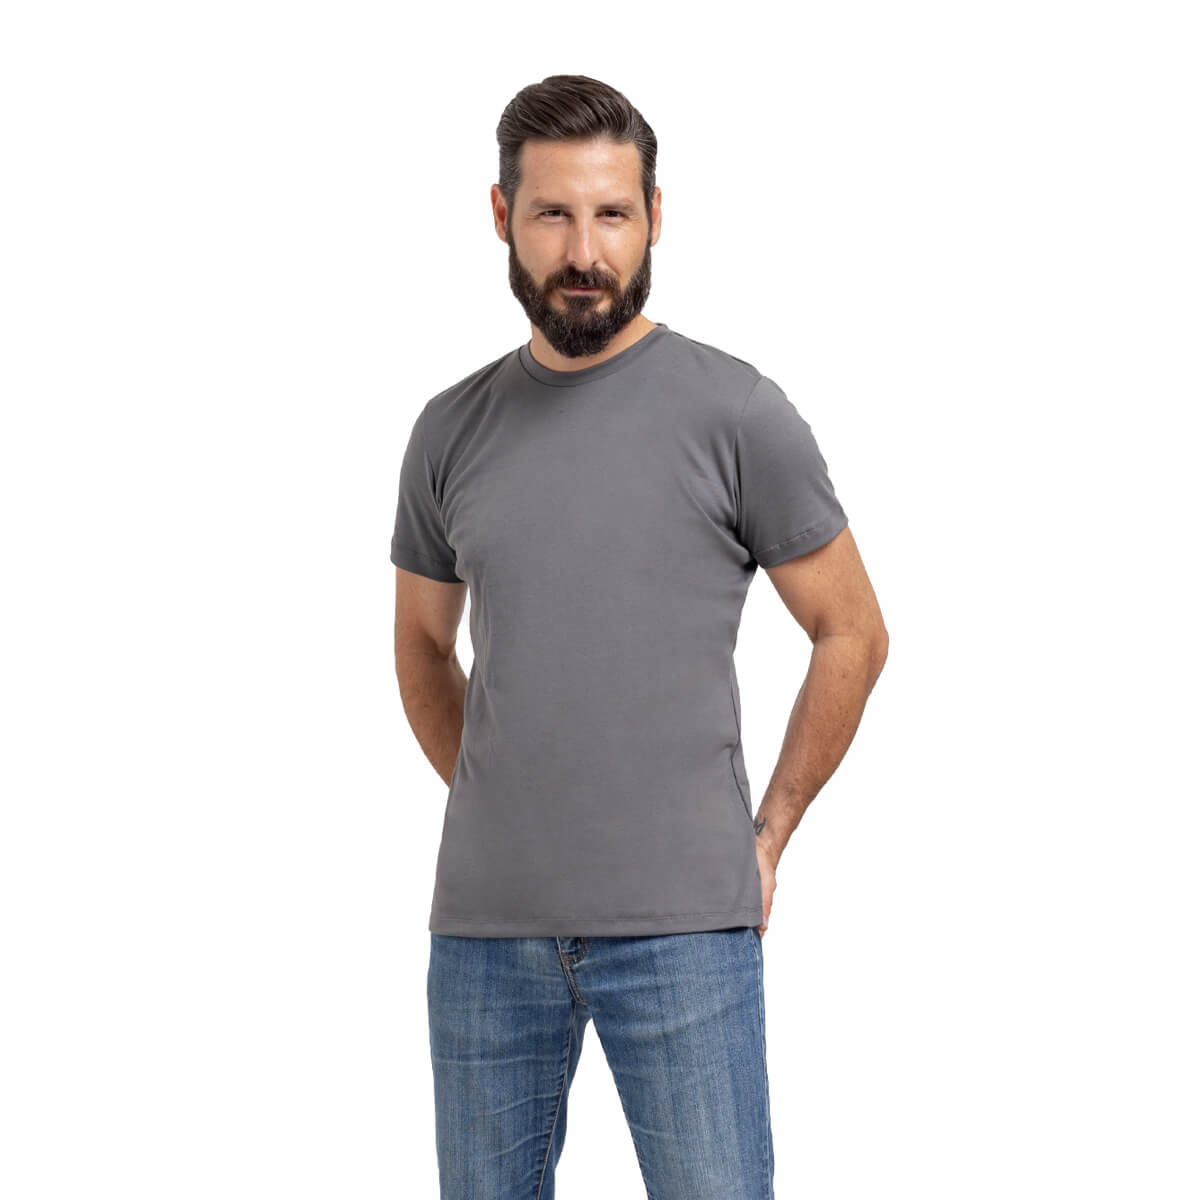 Franela esencial cuello redondo gris hombre frente